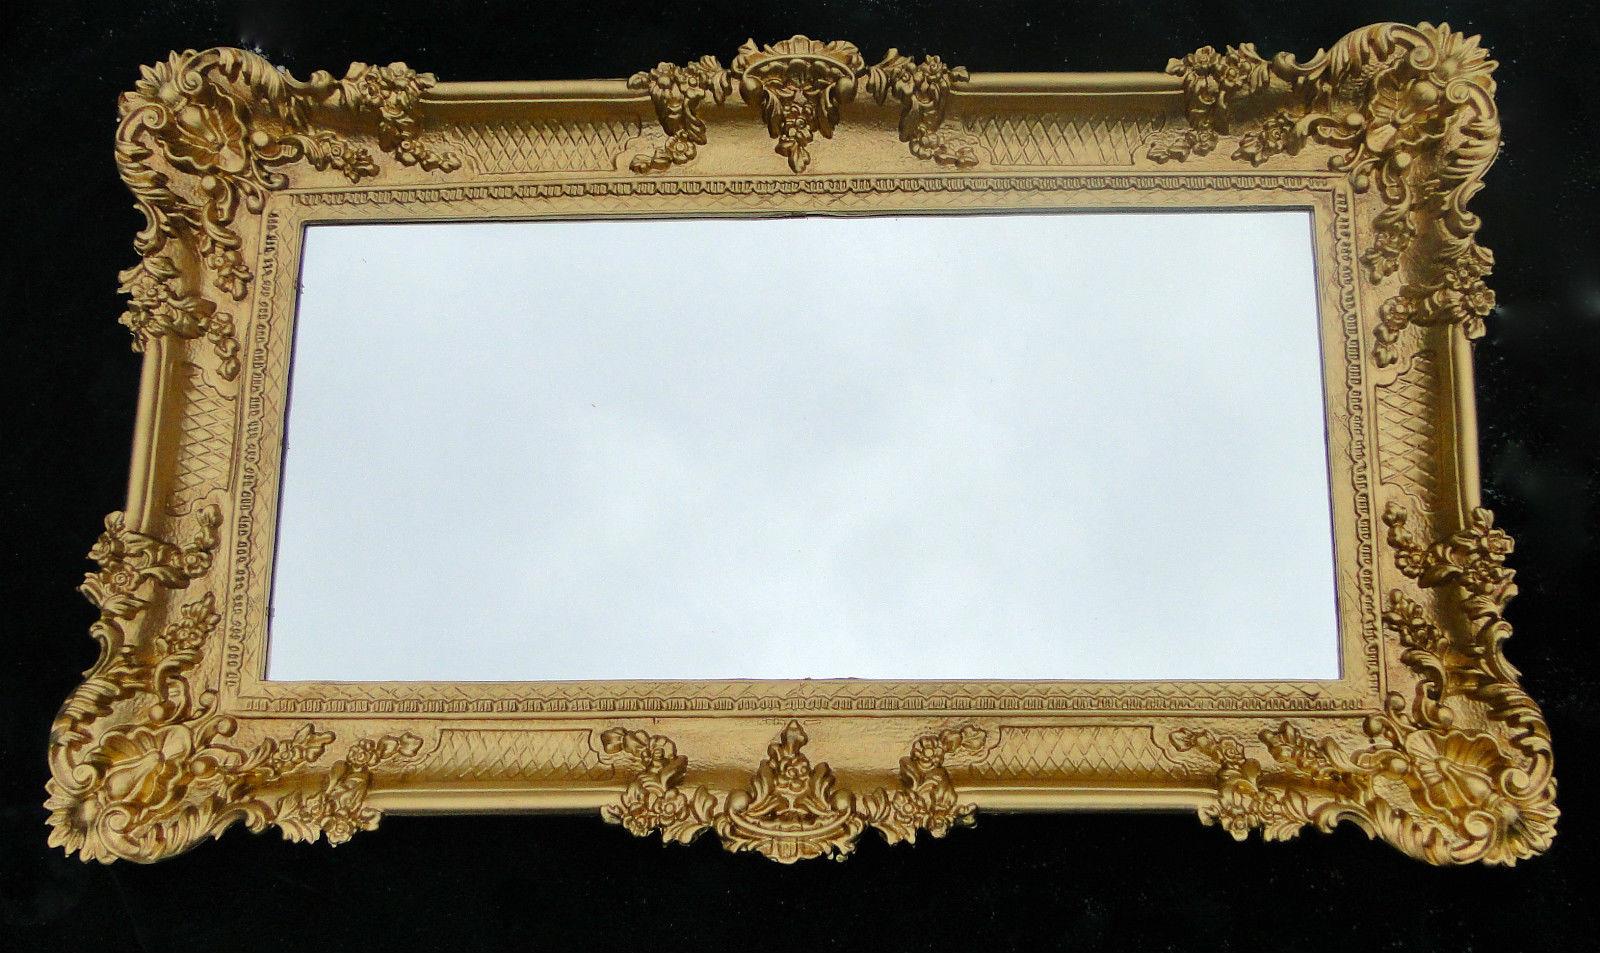 Wandspiegel Barock Gold Spiegel Antik 96x57 Badspiegel groß ...